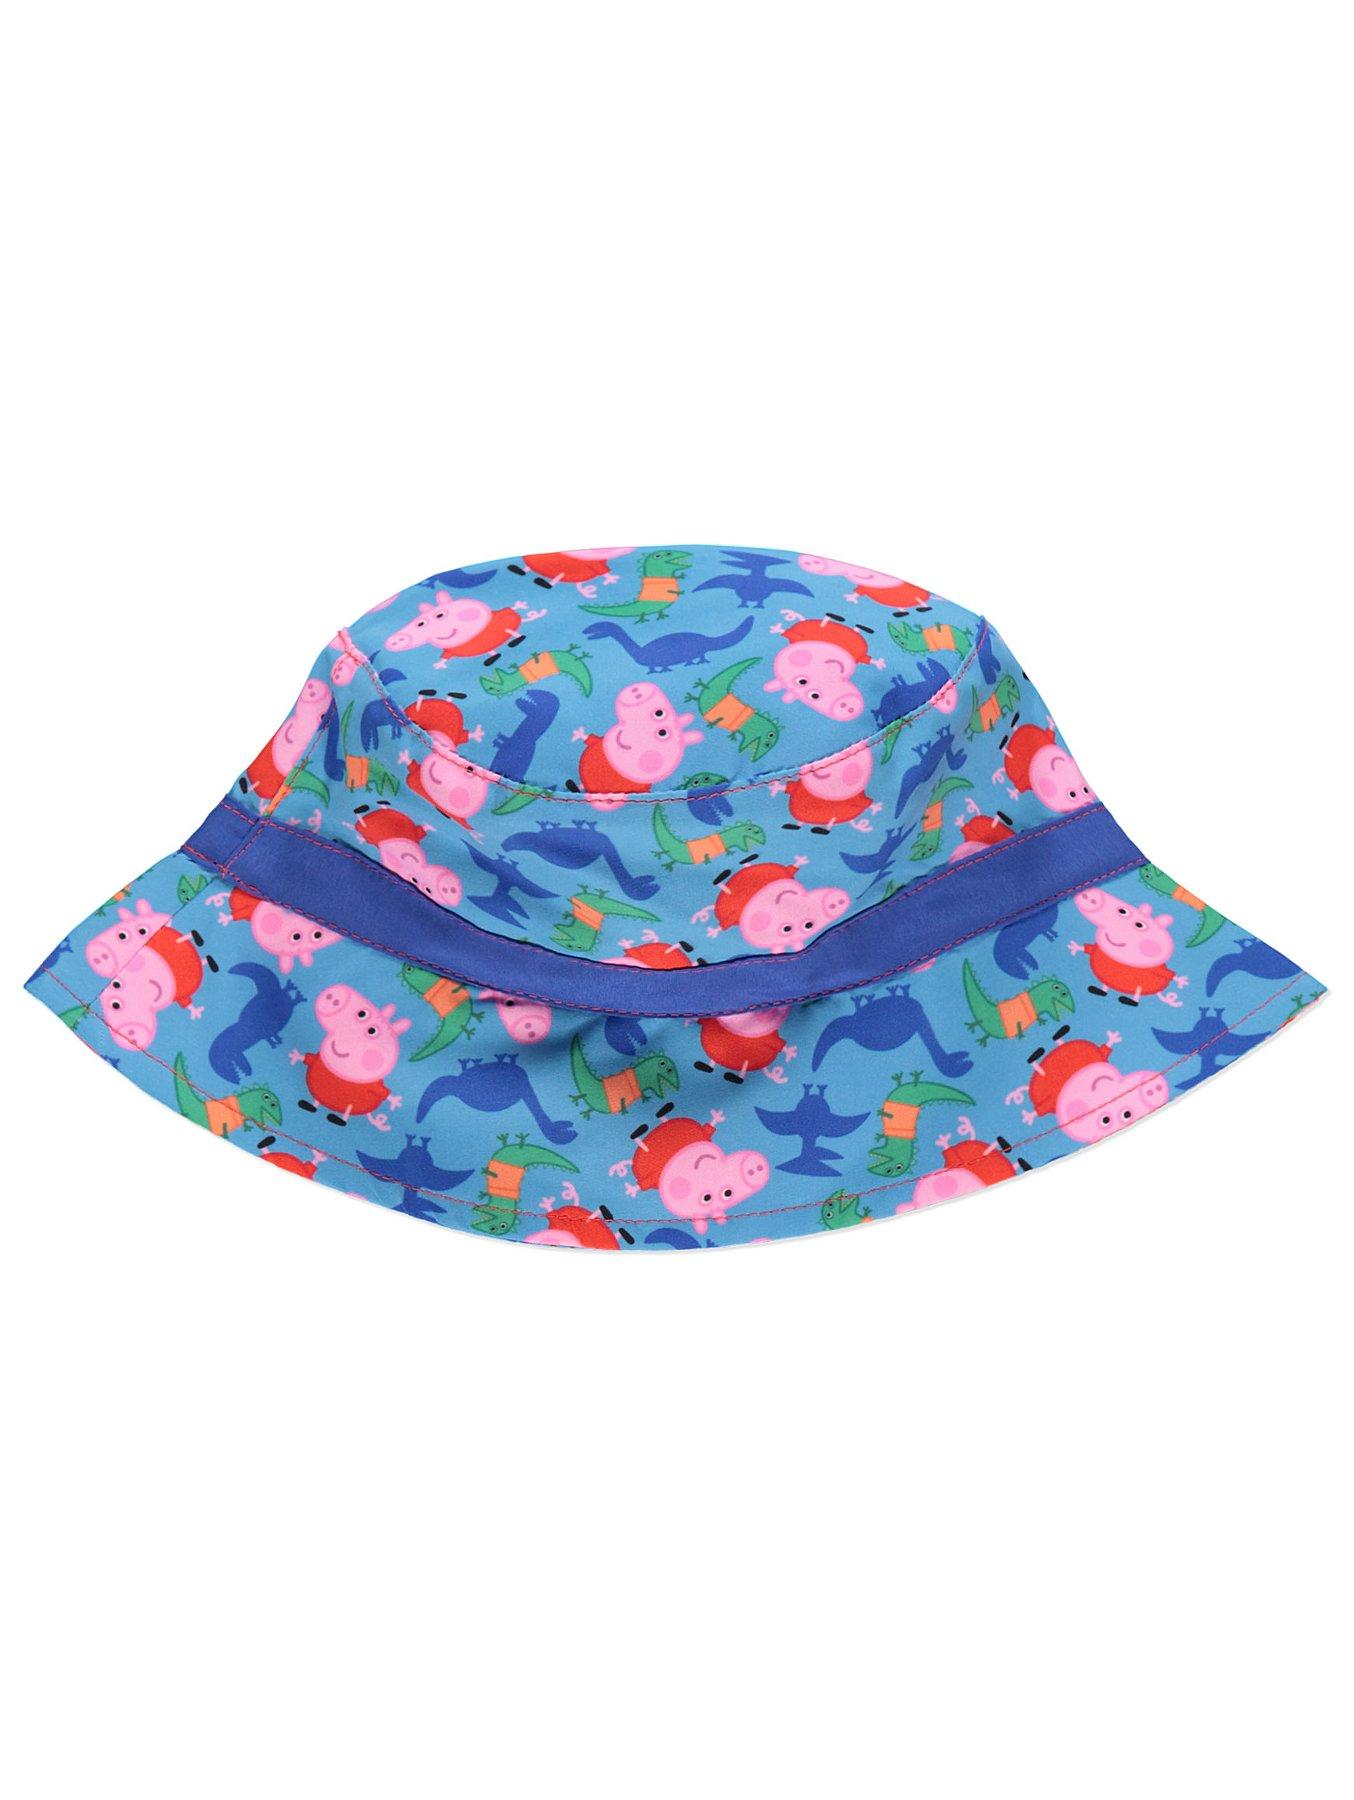 Peppa Pig UPF 50+ Sun Protection Bucket Hat. Reset 93ddcb63727